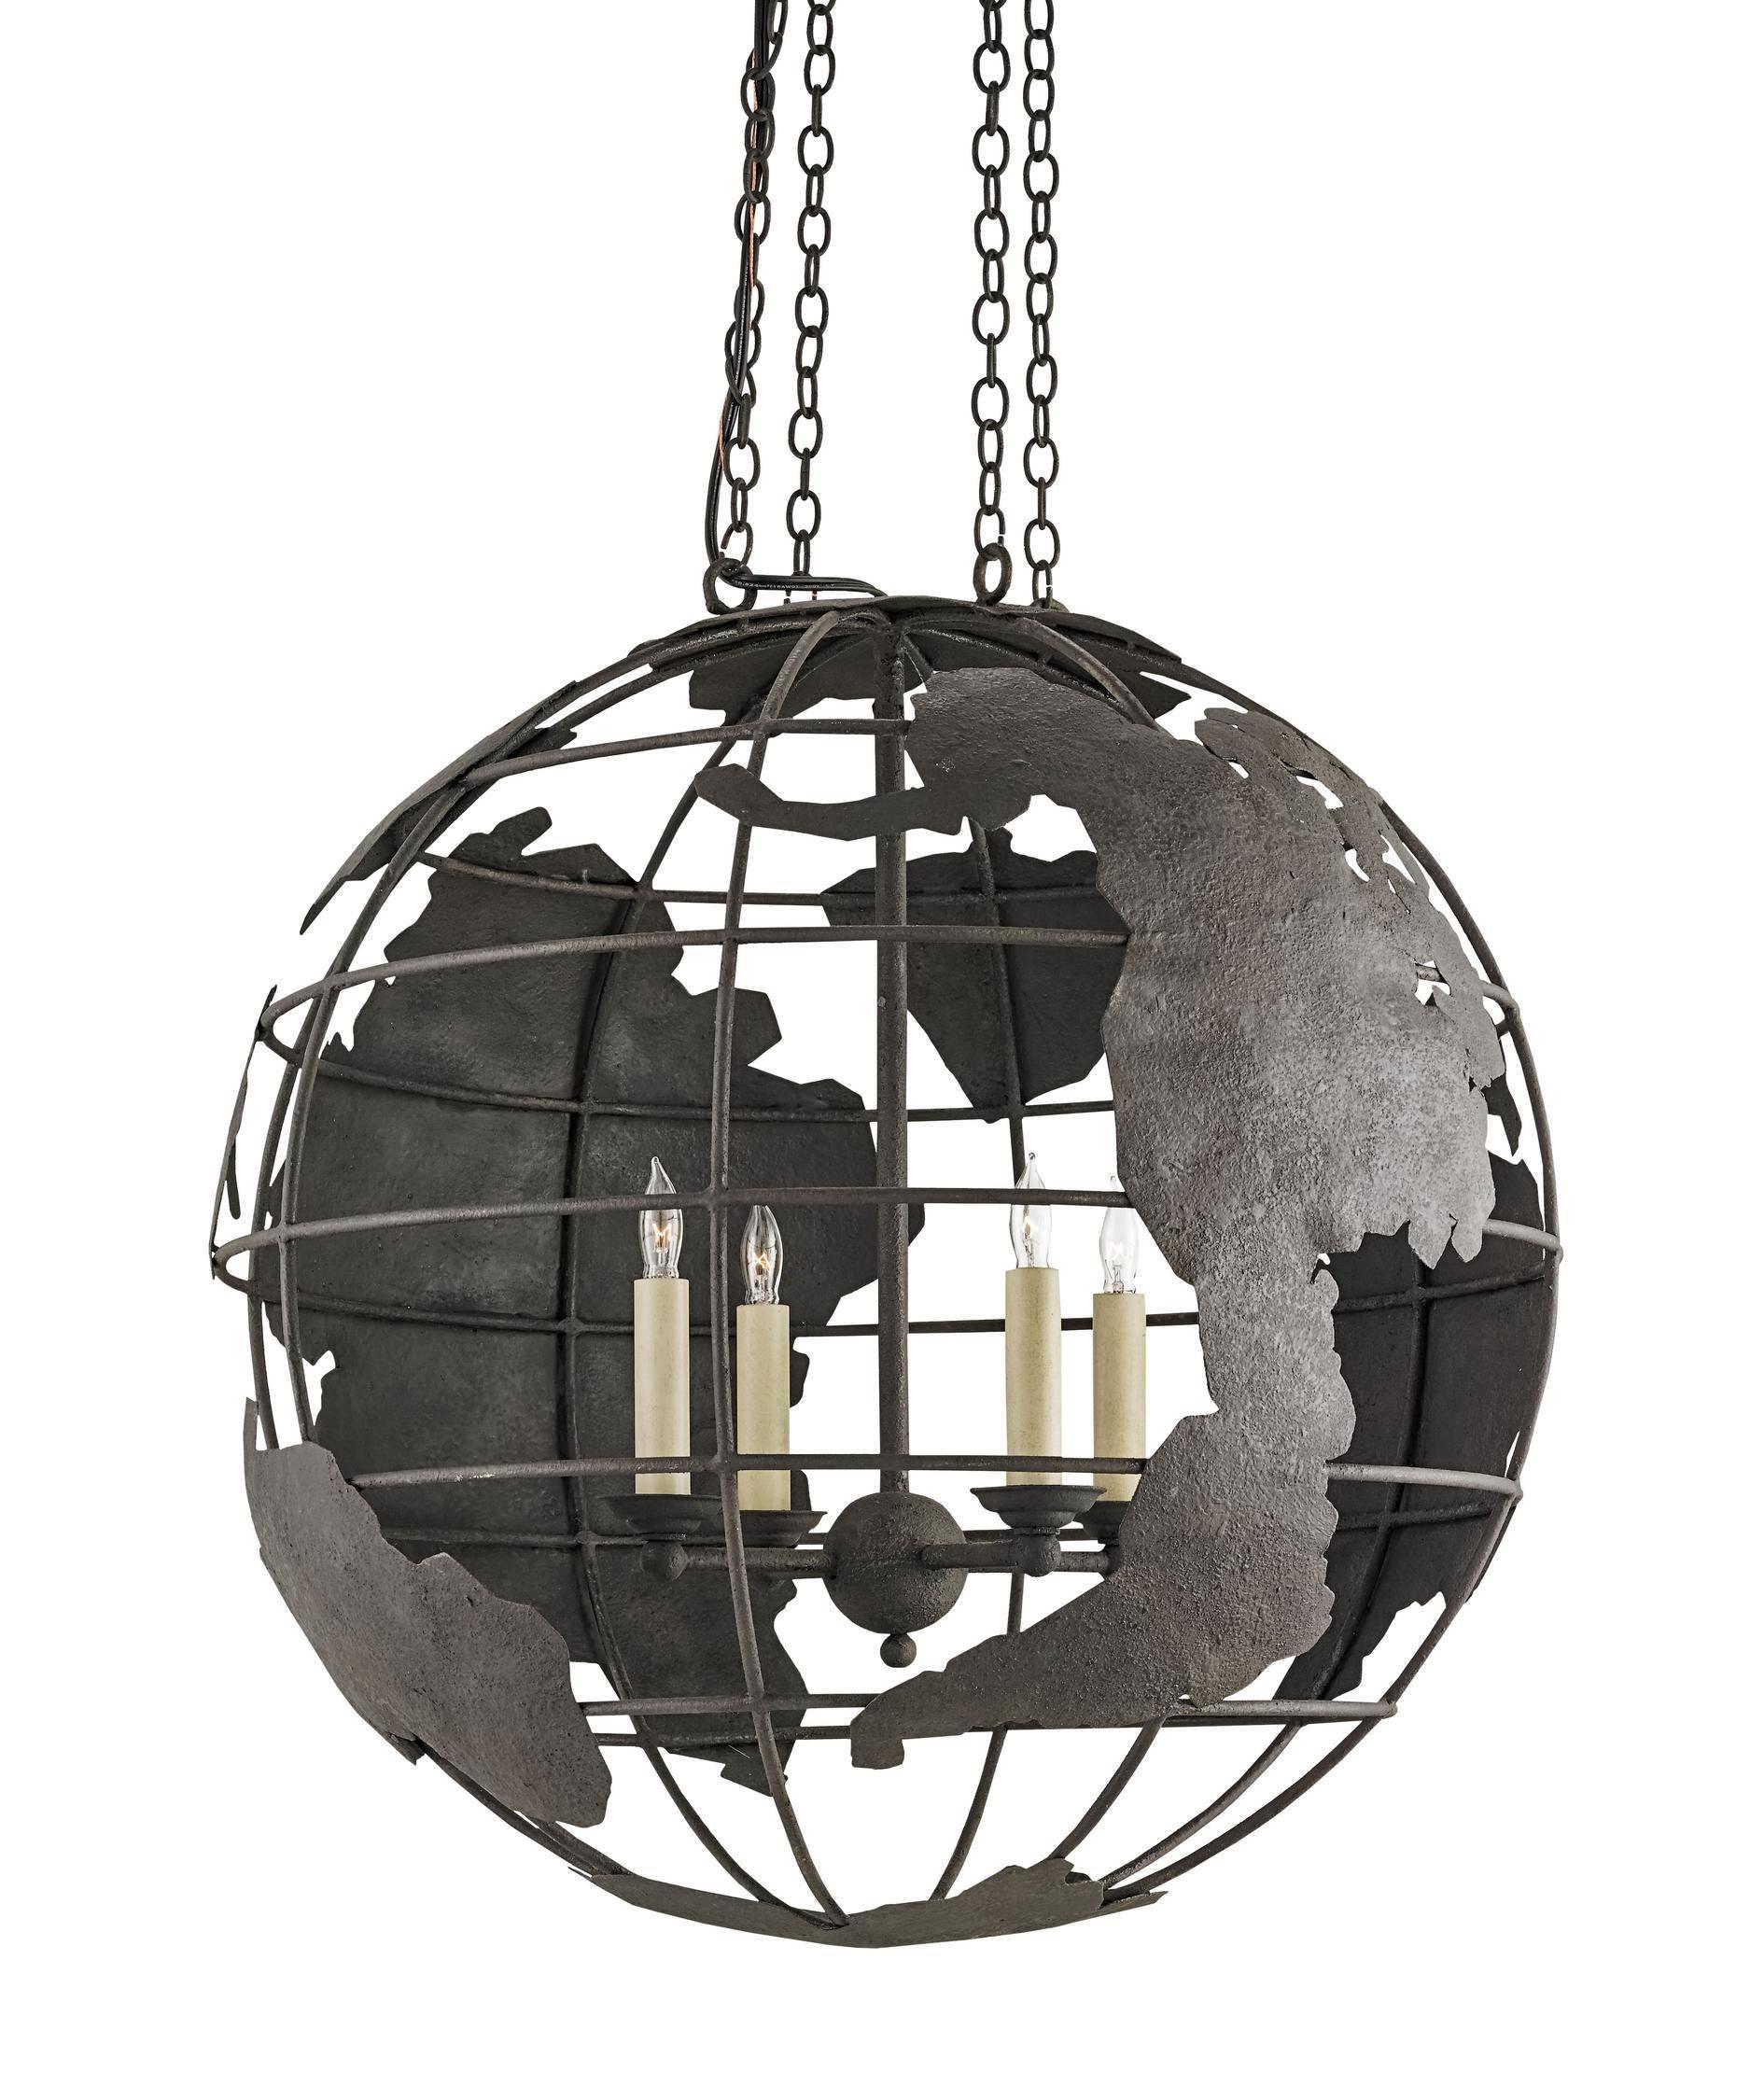 Currey And Company 9208 Mondo 23 Inch Wide 4 Light Large Pendant regarding World Globe Pendant Lights (Image 4 of 15)